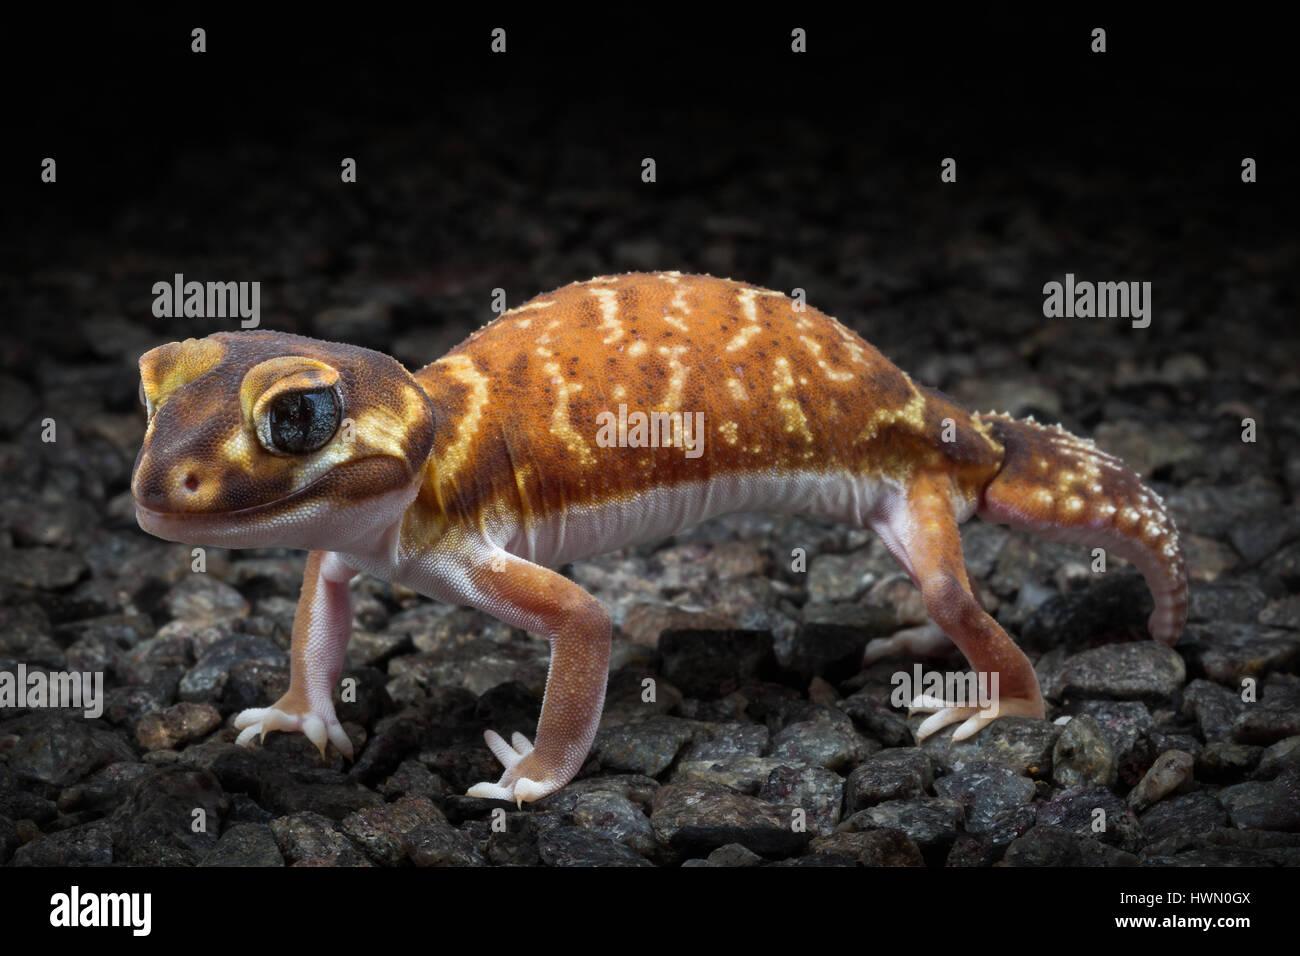 Smooth Knob-tailed Gecko (Nephrurus levis) Stock Photo